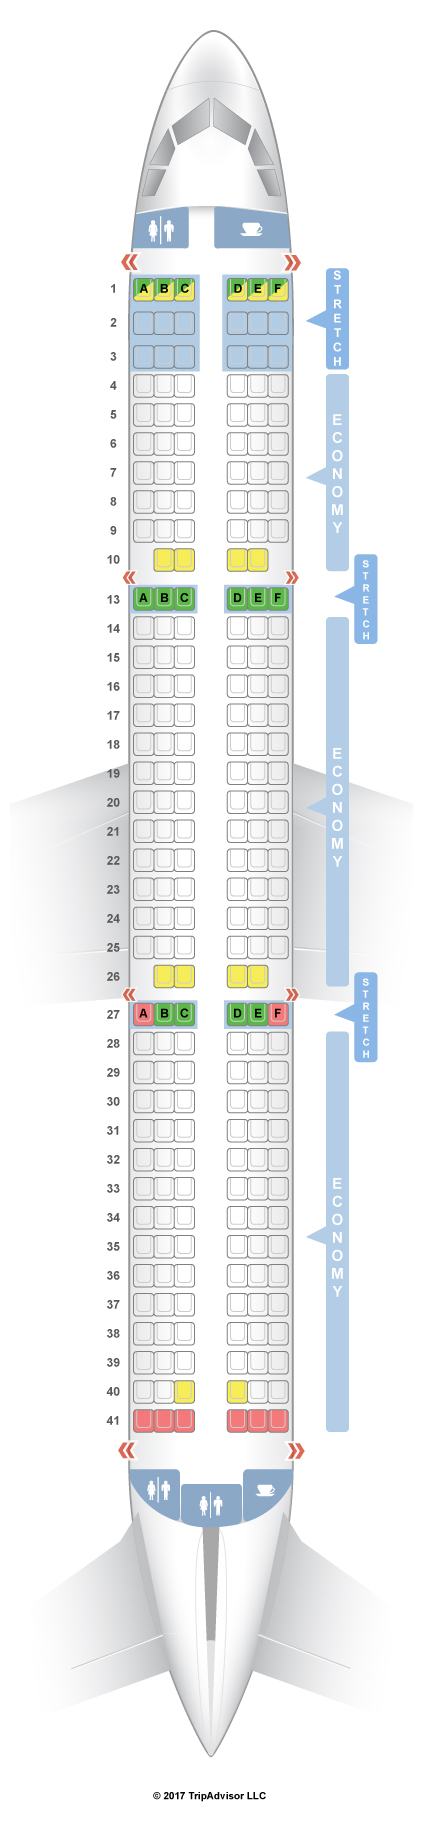 Seatguru Seat Map Frontier Airbus A321 321